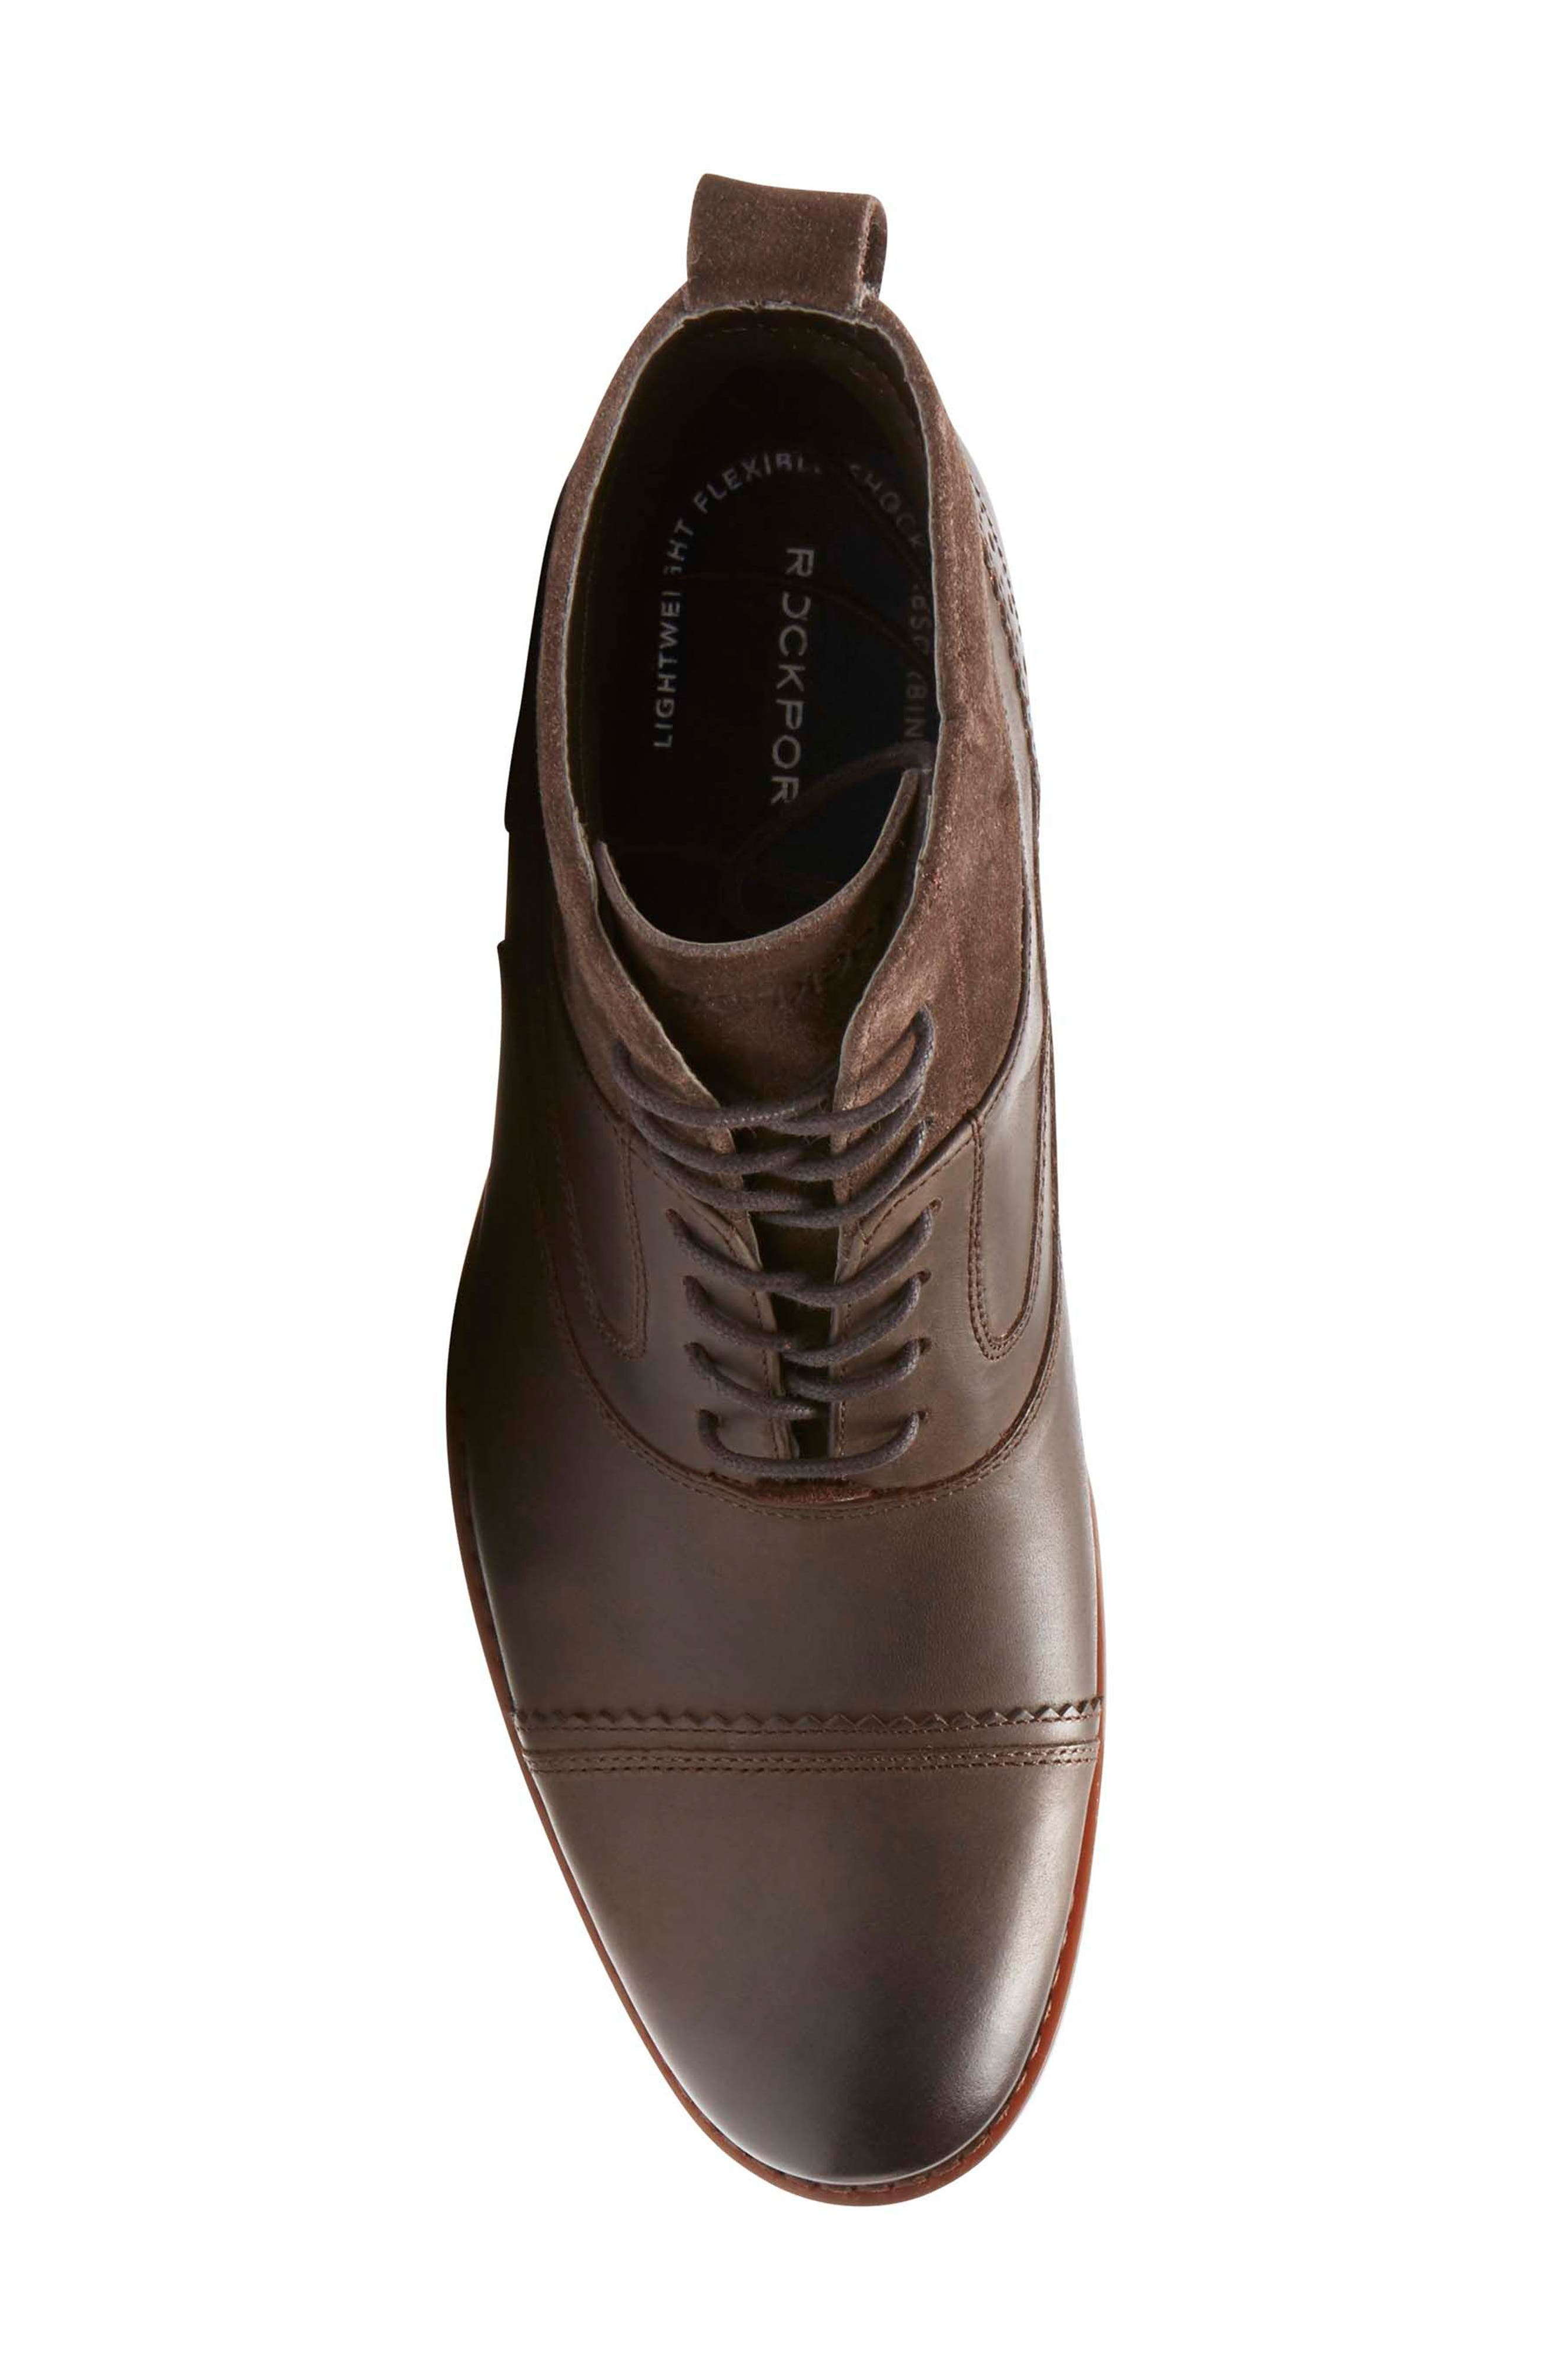 Wynstin Cap Toe Boot,                             Alternate thumbnail 5, color,                             Dark Chocolate Leather